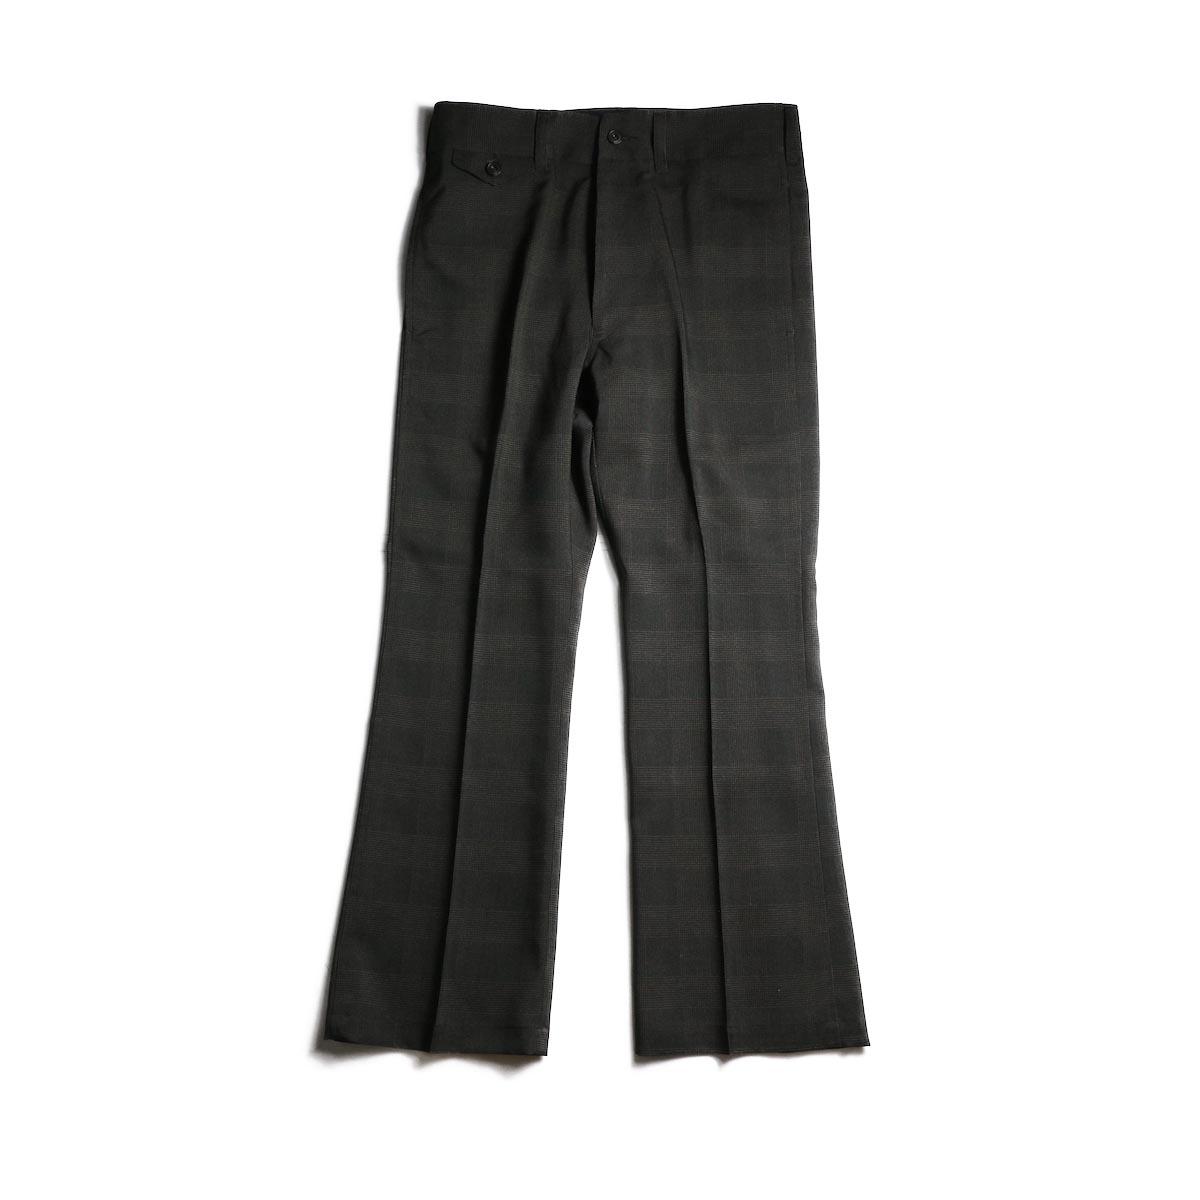 Needles / Flap Pocket Boot-Cut Trouser -Tropical Poly Cloth (Brn/Plaid)